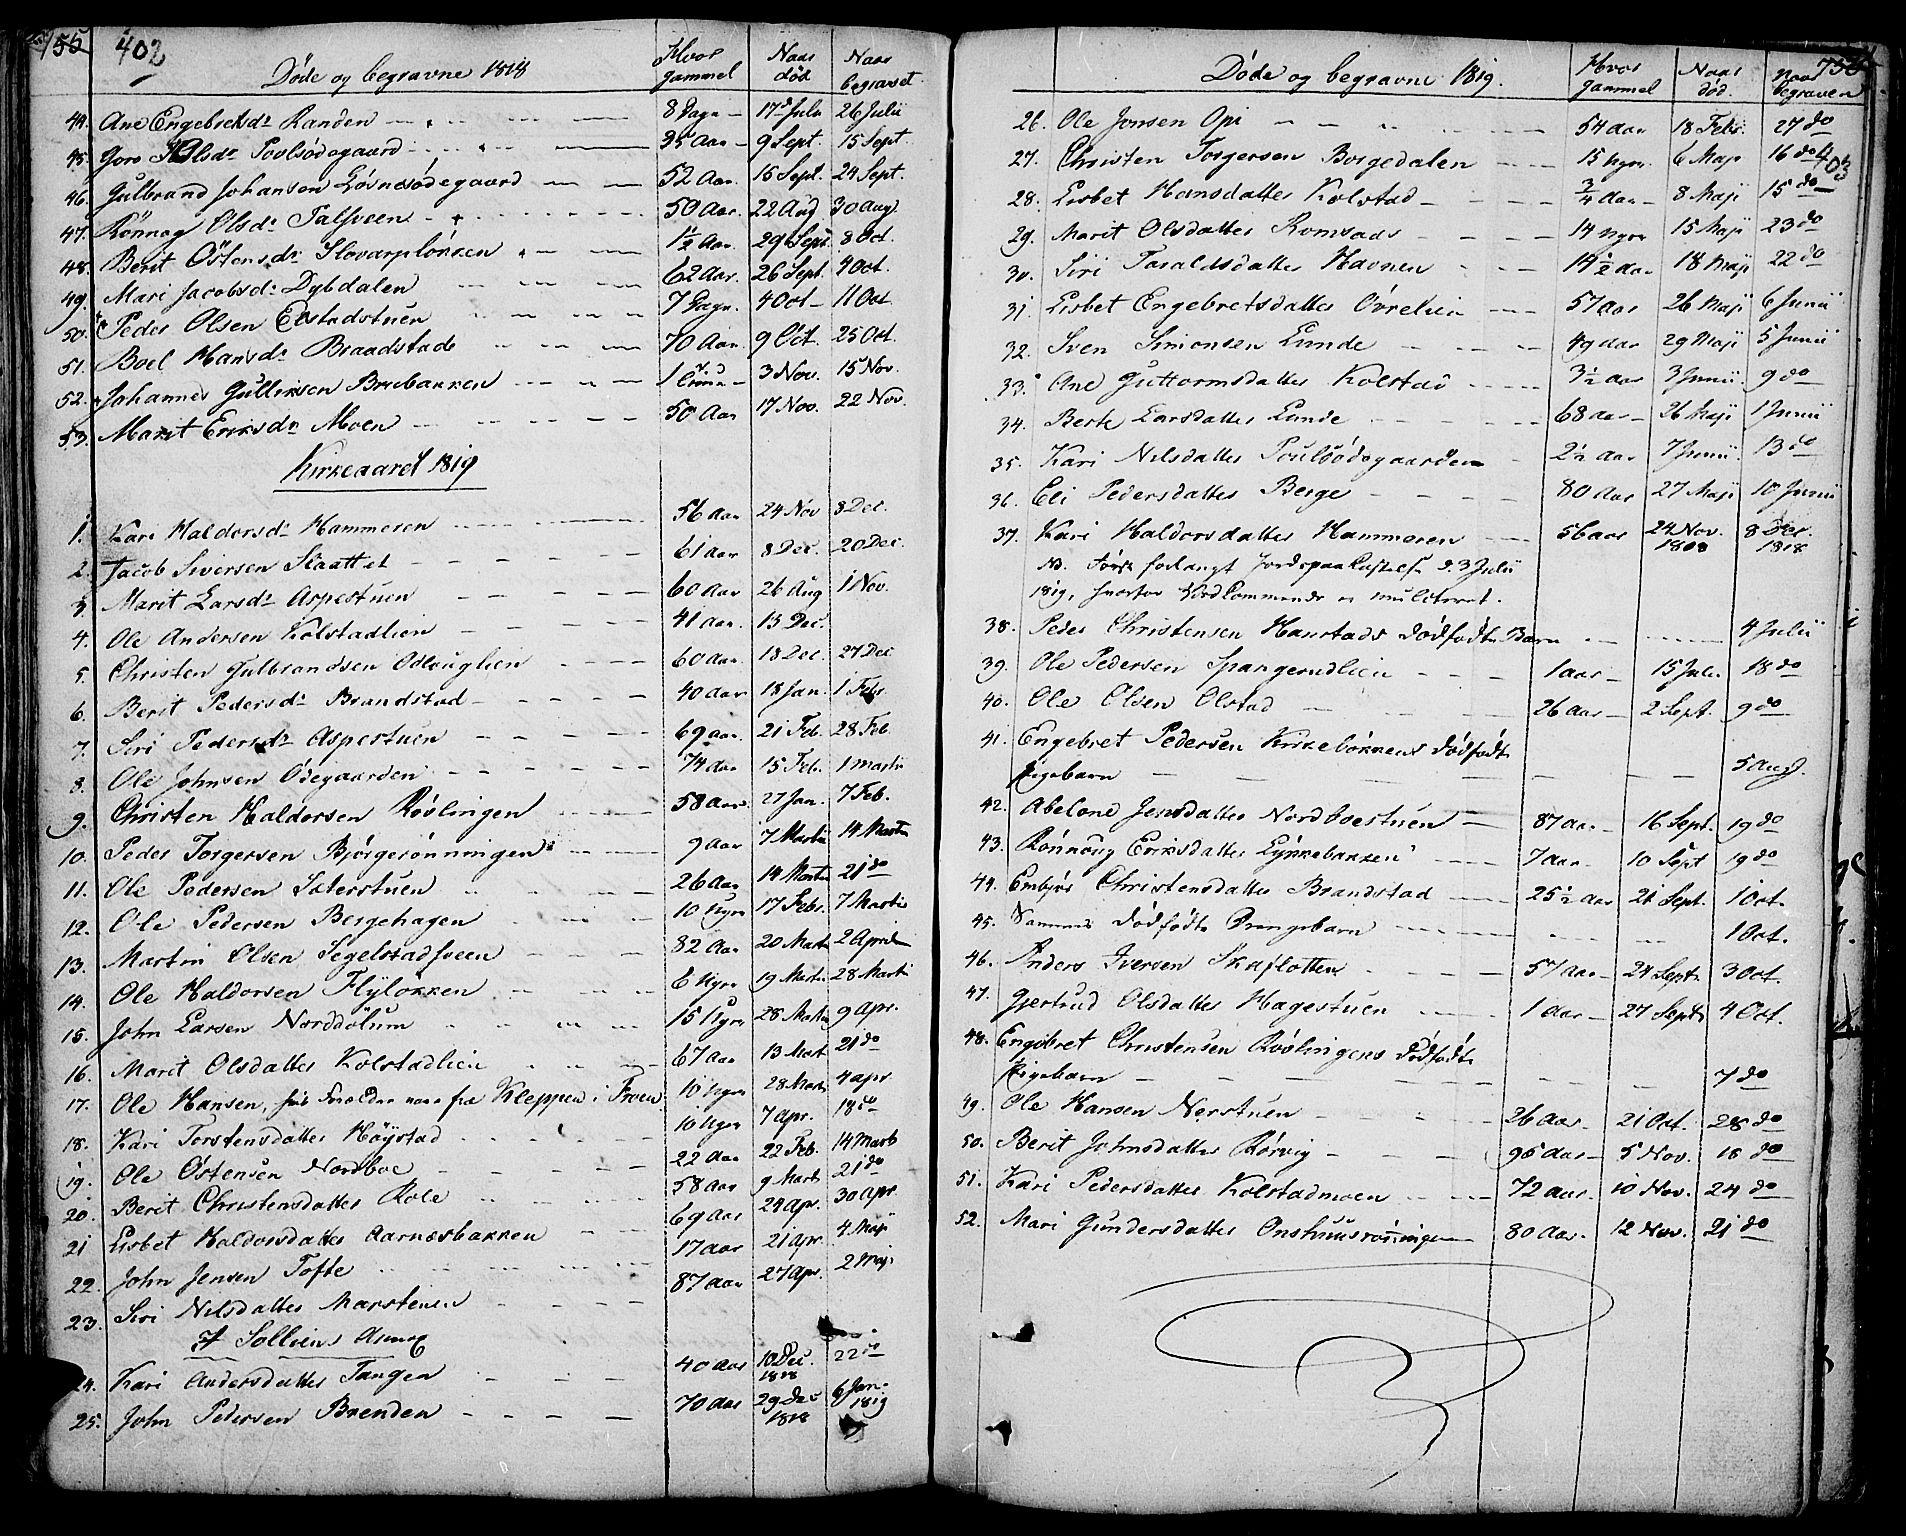 SAH, Ringebu prestekontor, Ministerialbok nr. 3, 1781-1820, s. 402-403